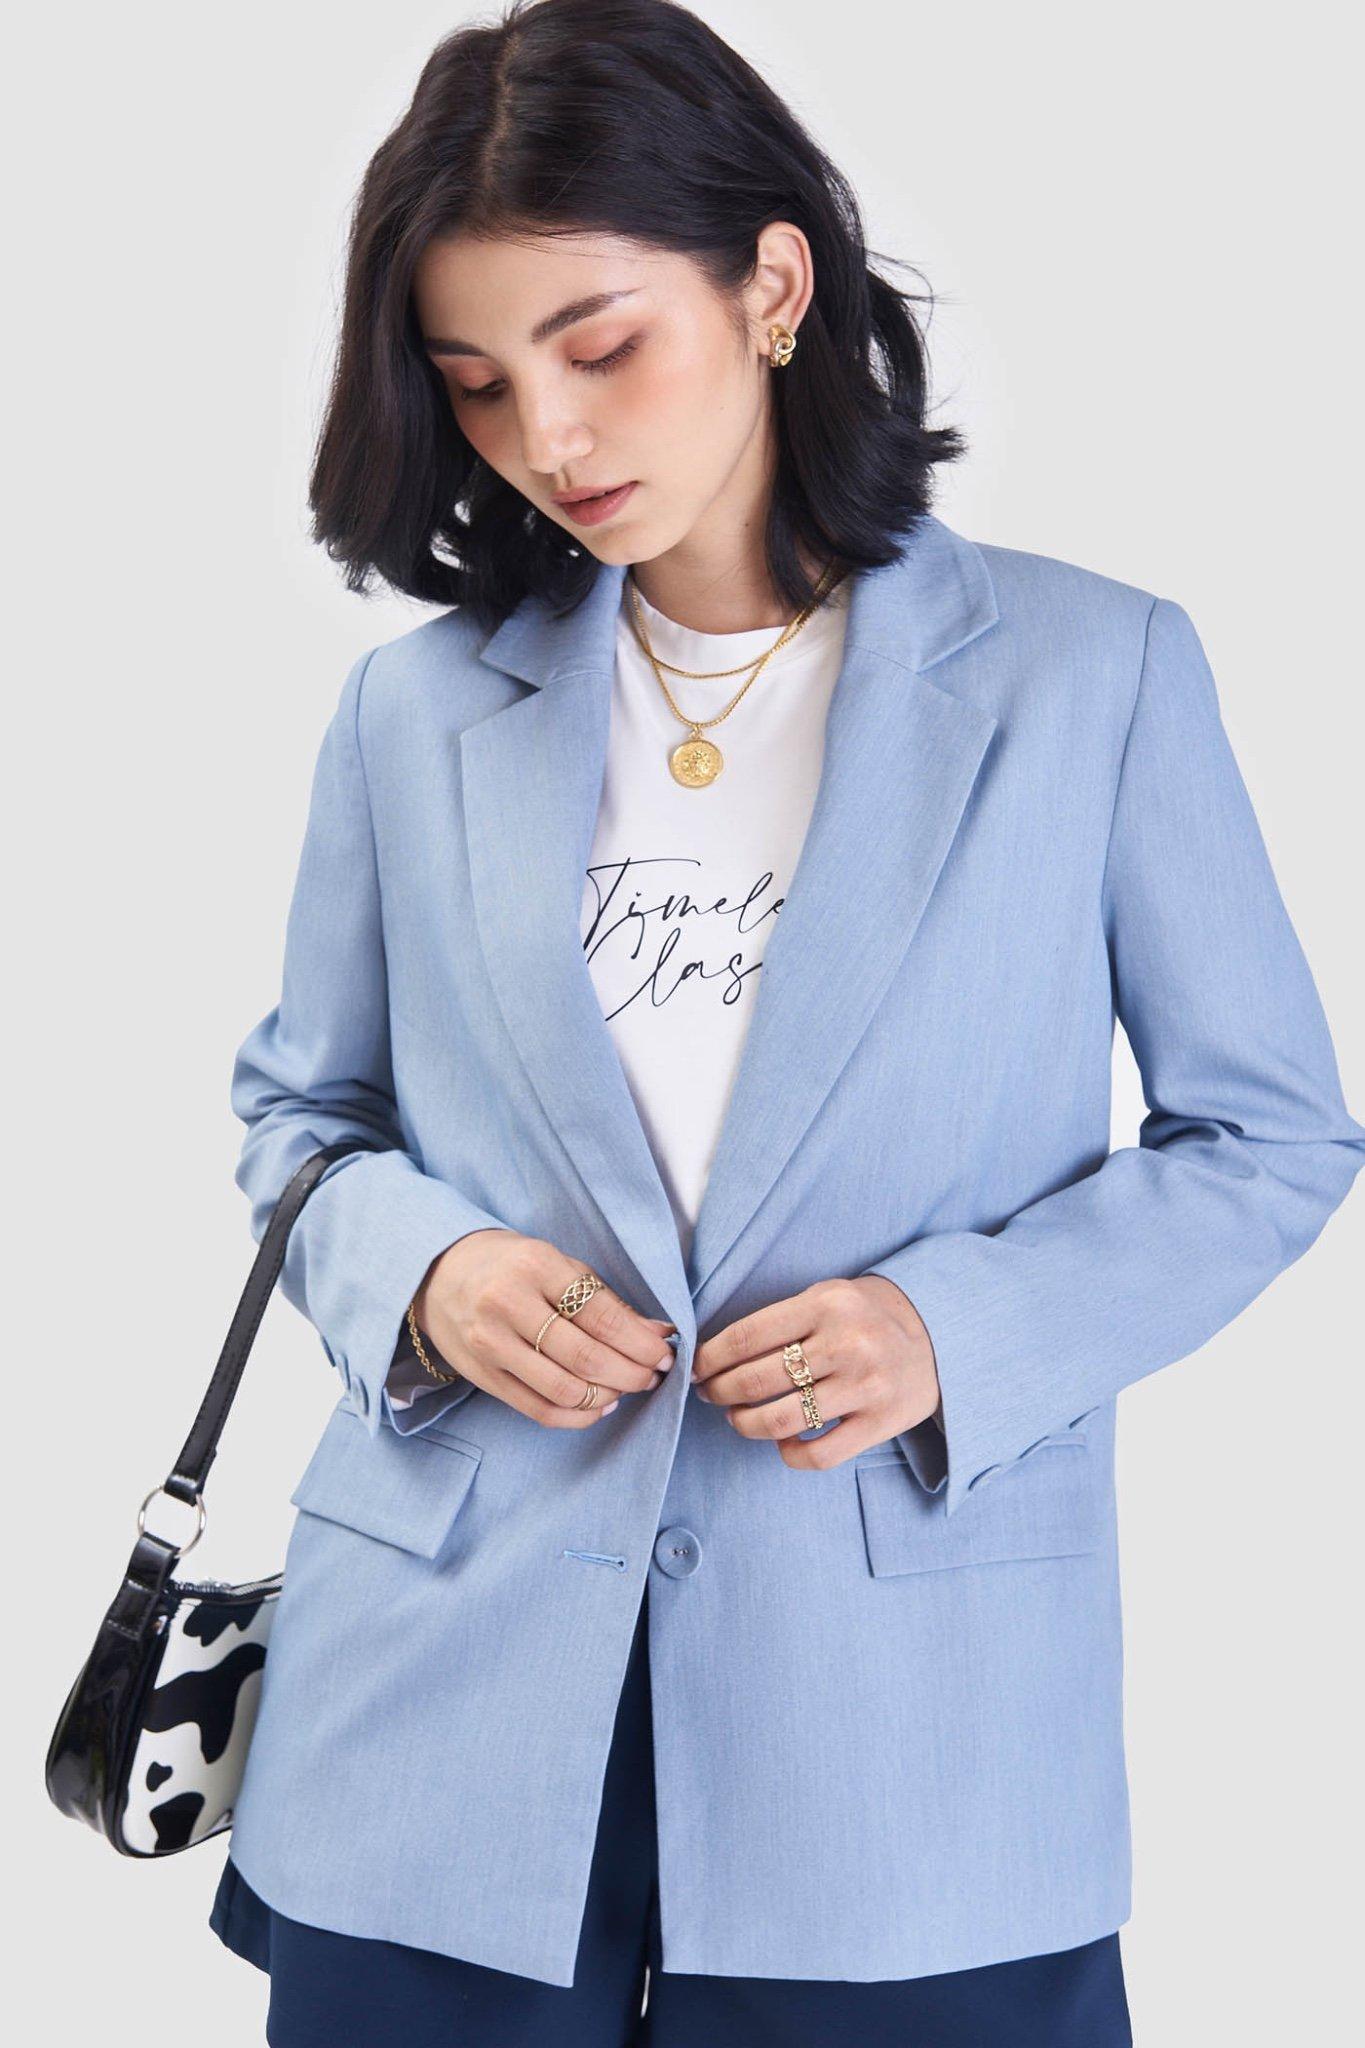 Áo khoác blazer form rộng